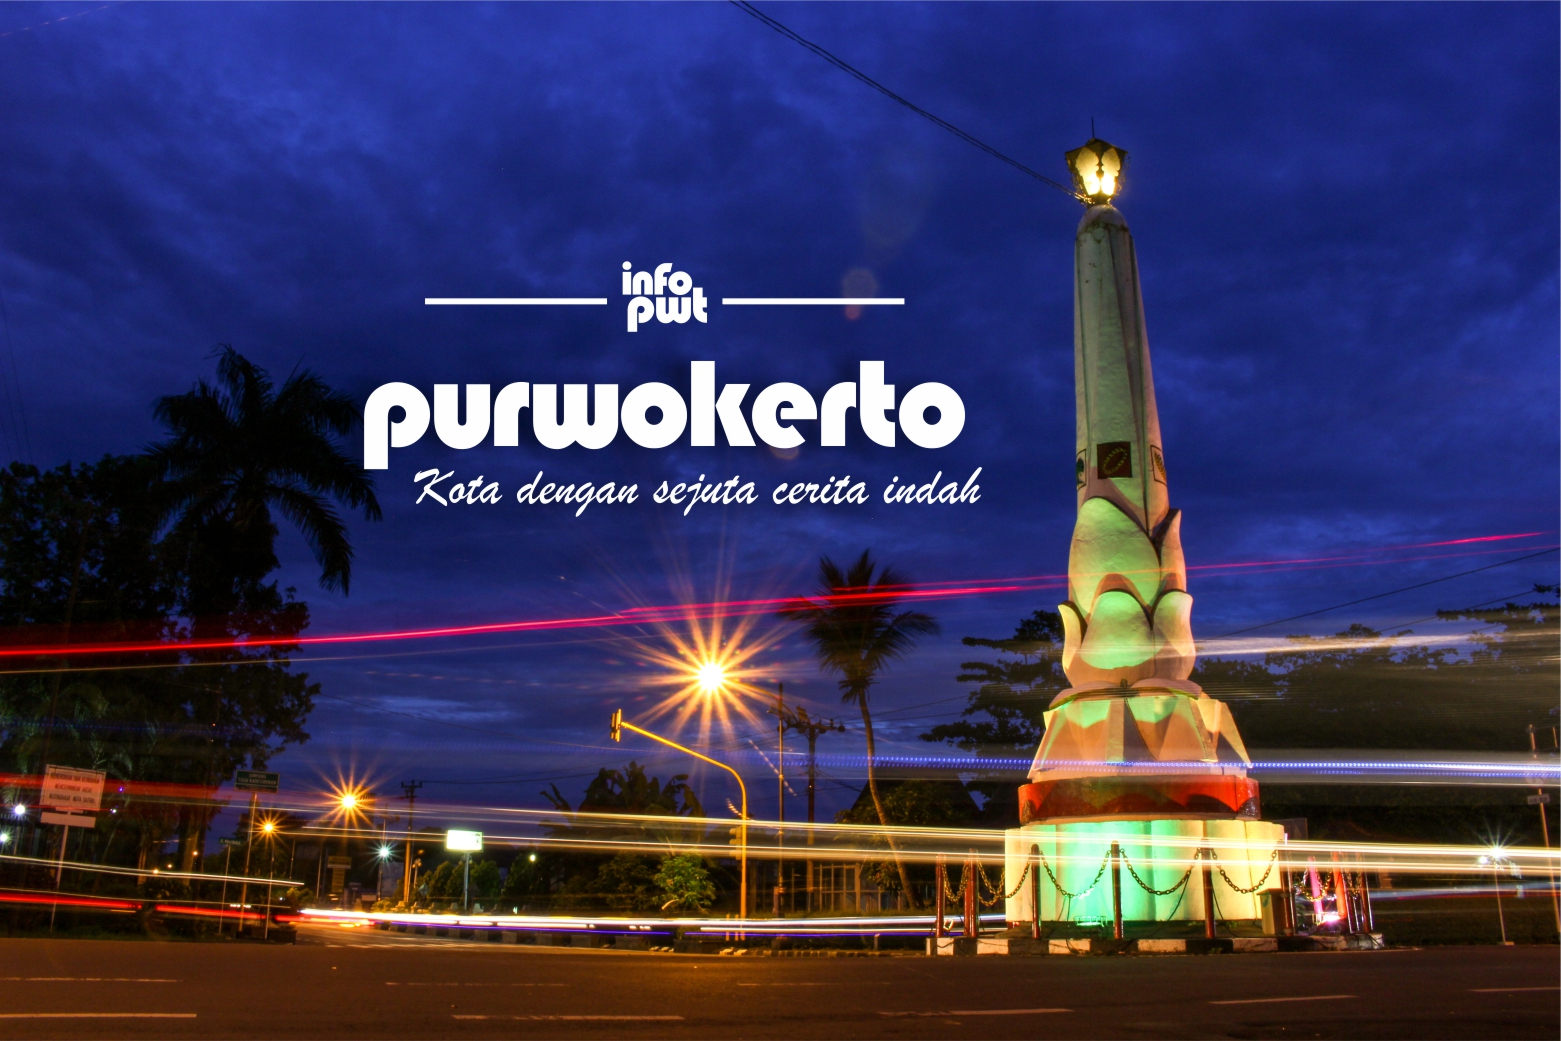 Purwokerto ibukota Banyumas | Foto : initu